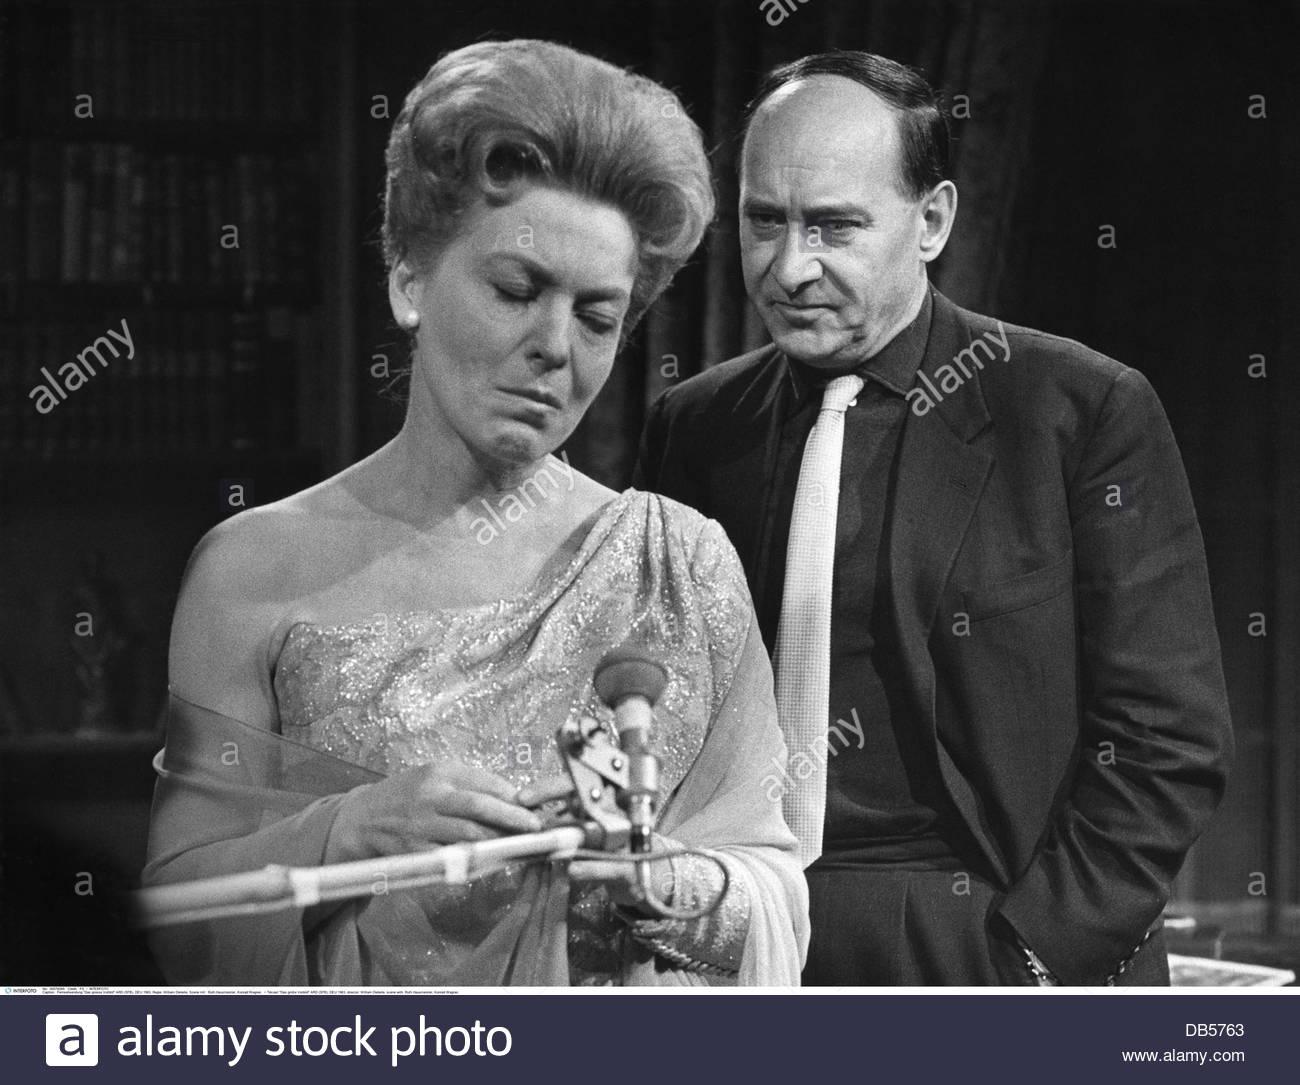 Telcast 'Das grosse Vorbild' ARD (SFB), DEU 1963, director: William Dieterle, scene with: Ruth Hausmeister, - Stock Image